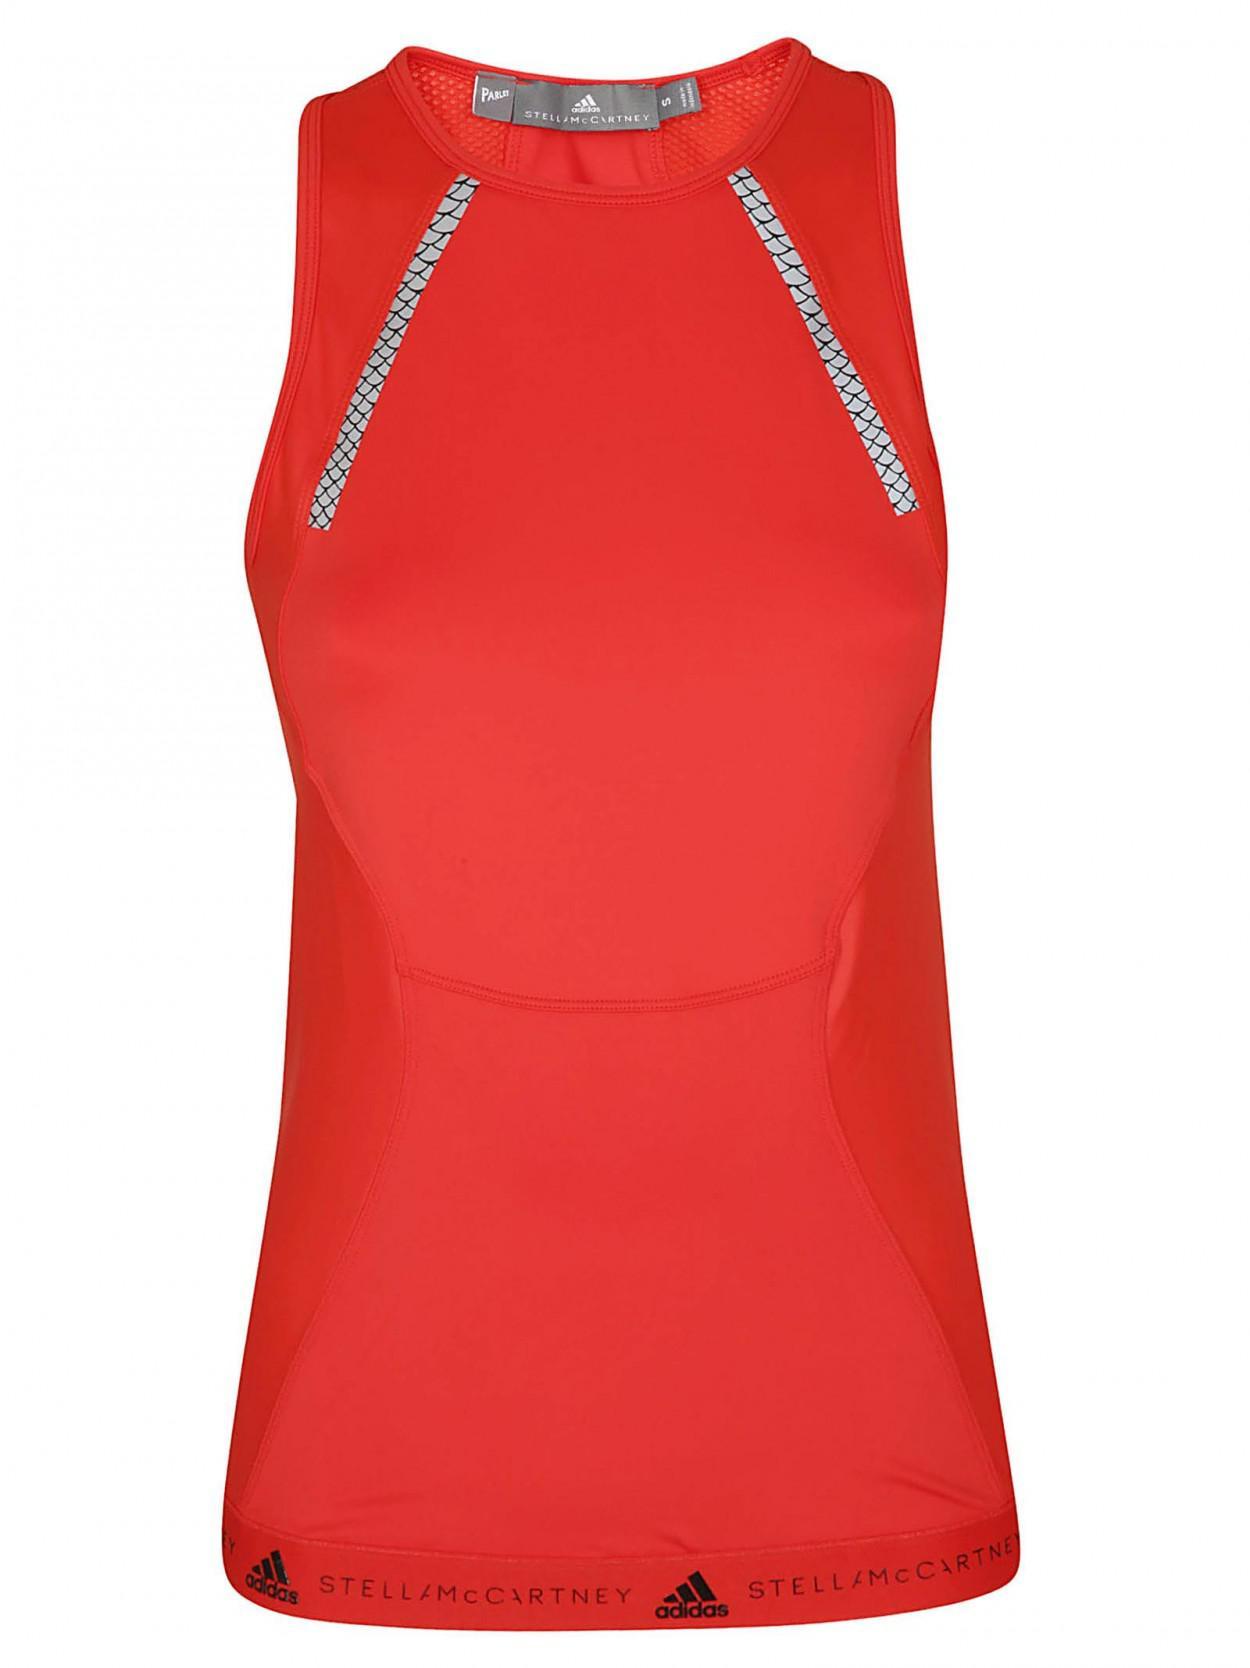 3e689acabf adidas By Stella McCartney. Women s Red ADIDAS BY STELLA MCCARTNEY Top run  tank rosso